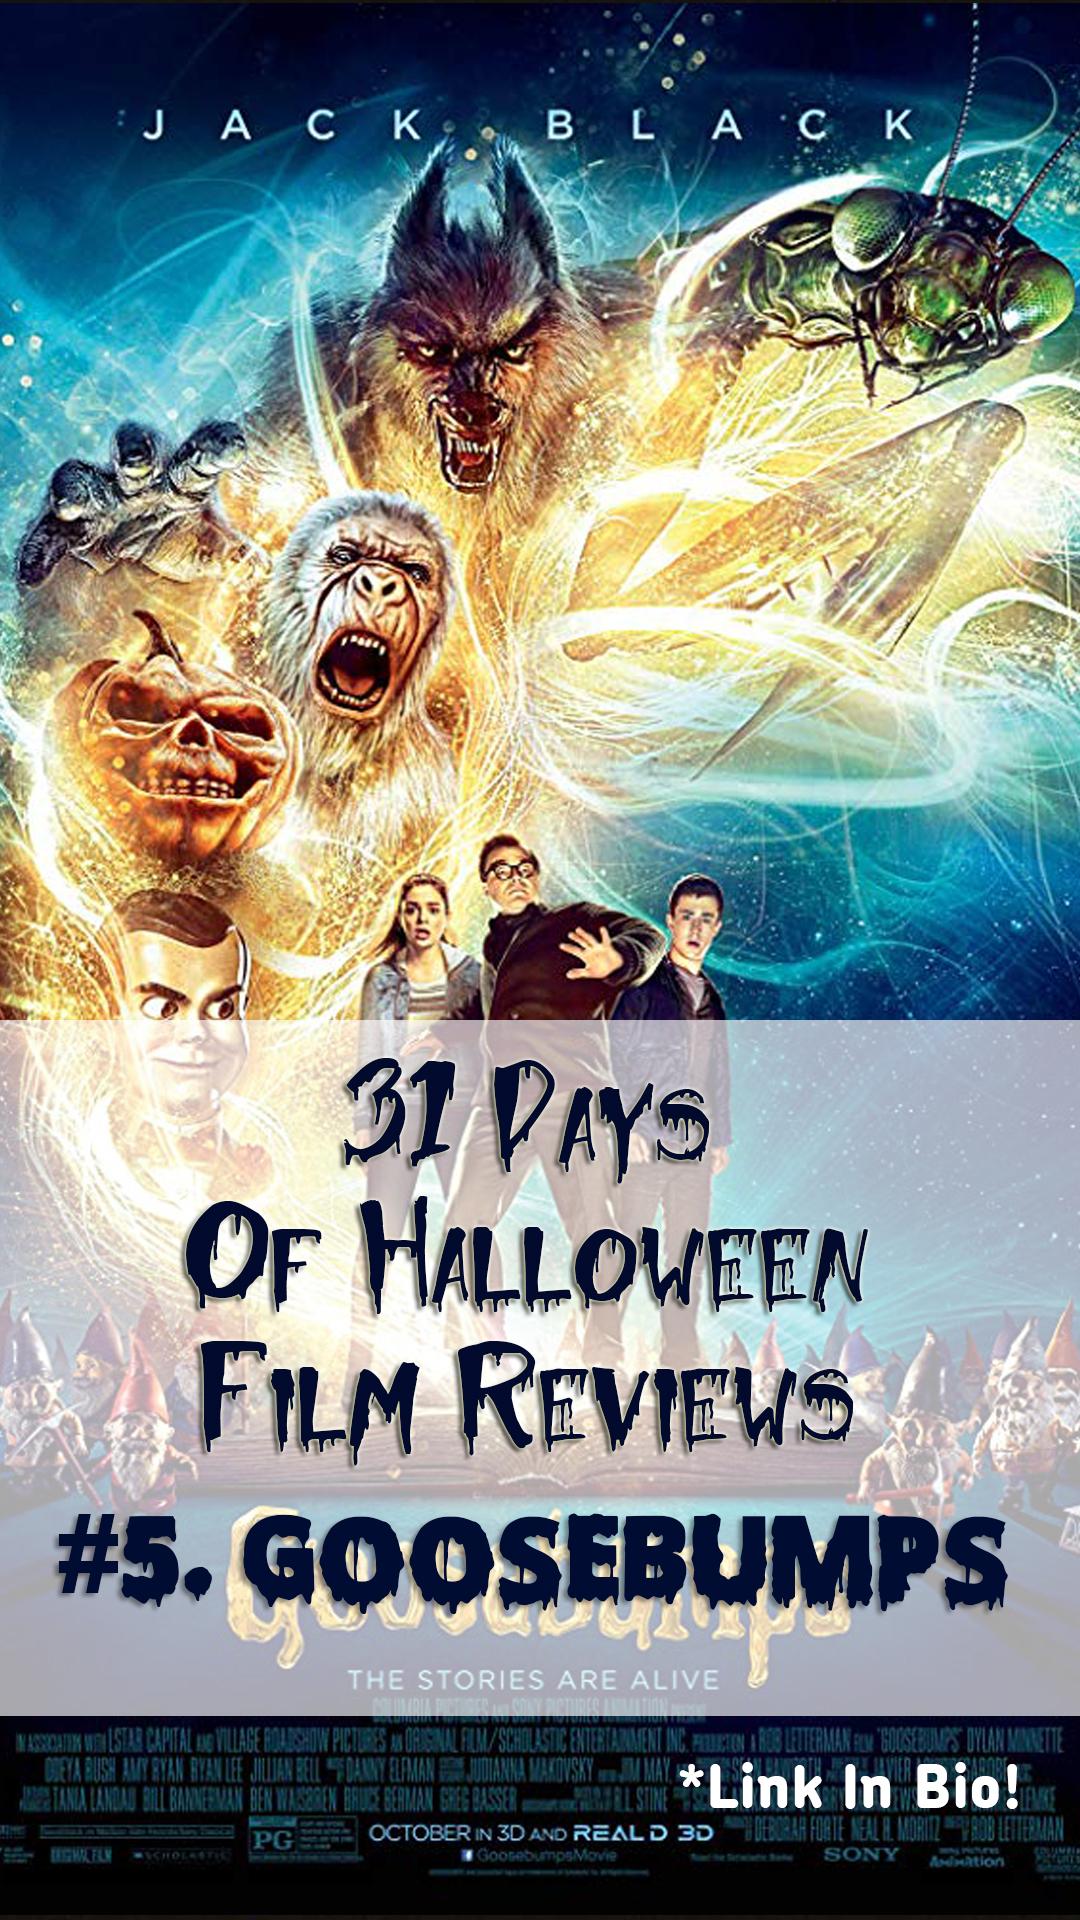 Goosebumps Film Review